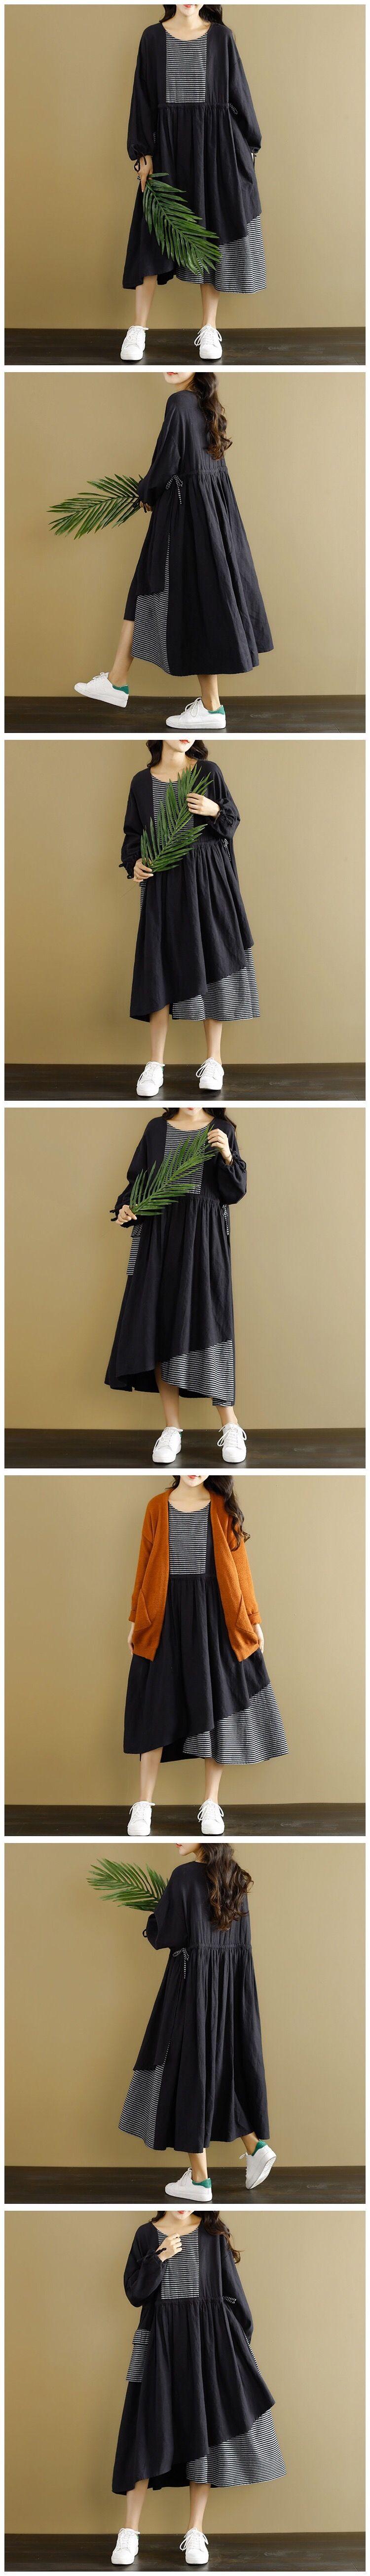 Black dress #blackdresscasual